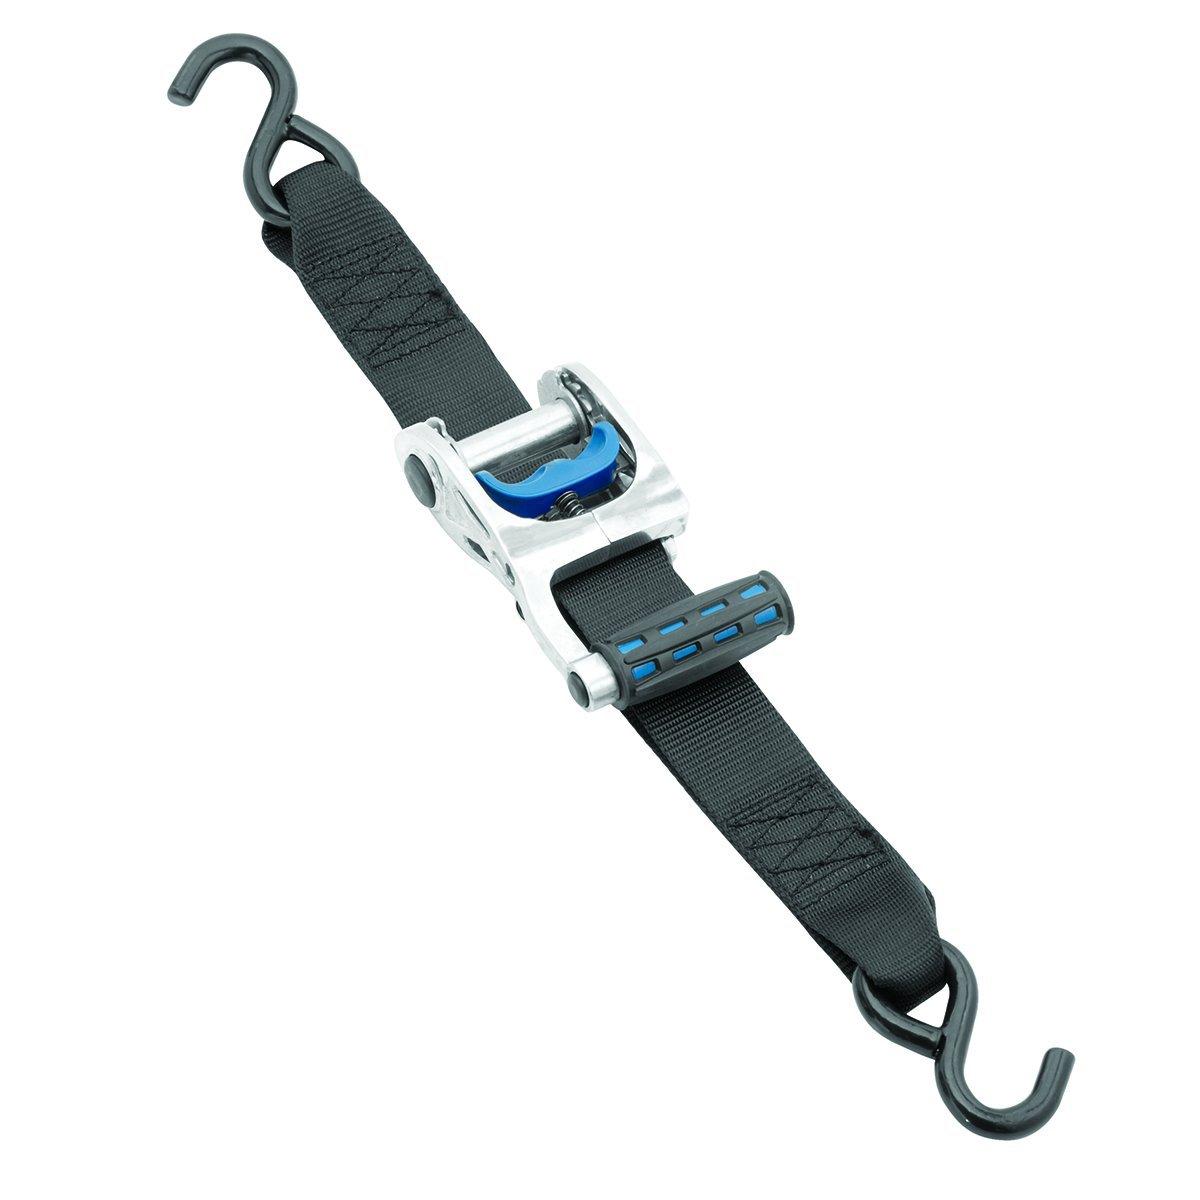 Fulton 2061266 2' x 10' Zinc Gunwale Max Grip Ratchet Tie Down Fulton 2061266 2 x 10' Zinc Gunwale Max Grip Ratchet Tie Down